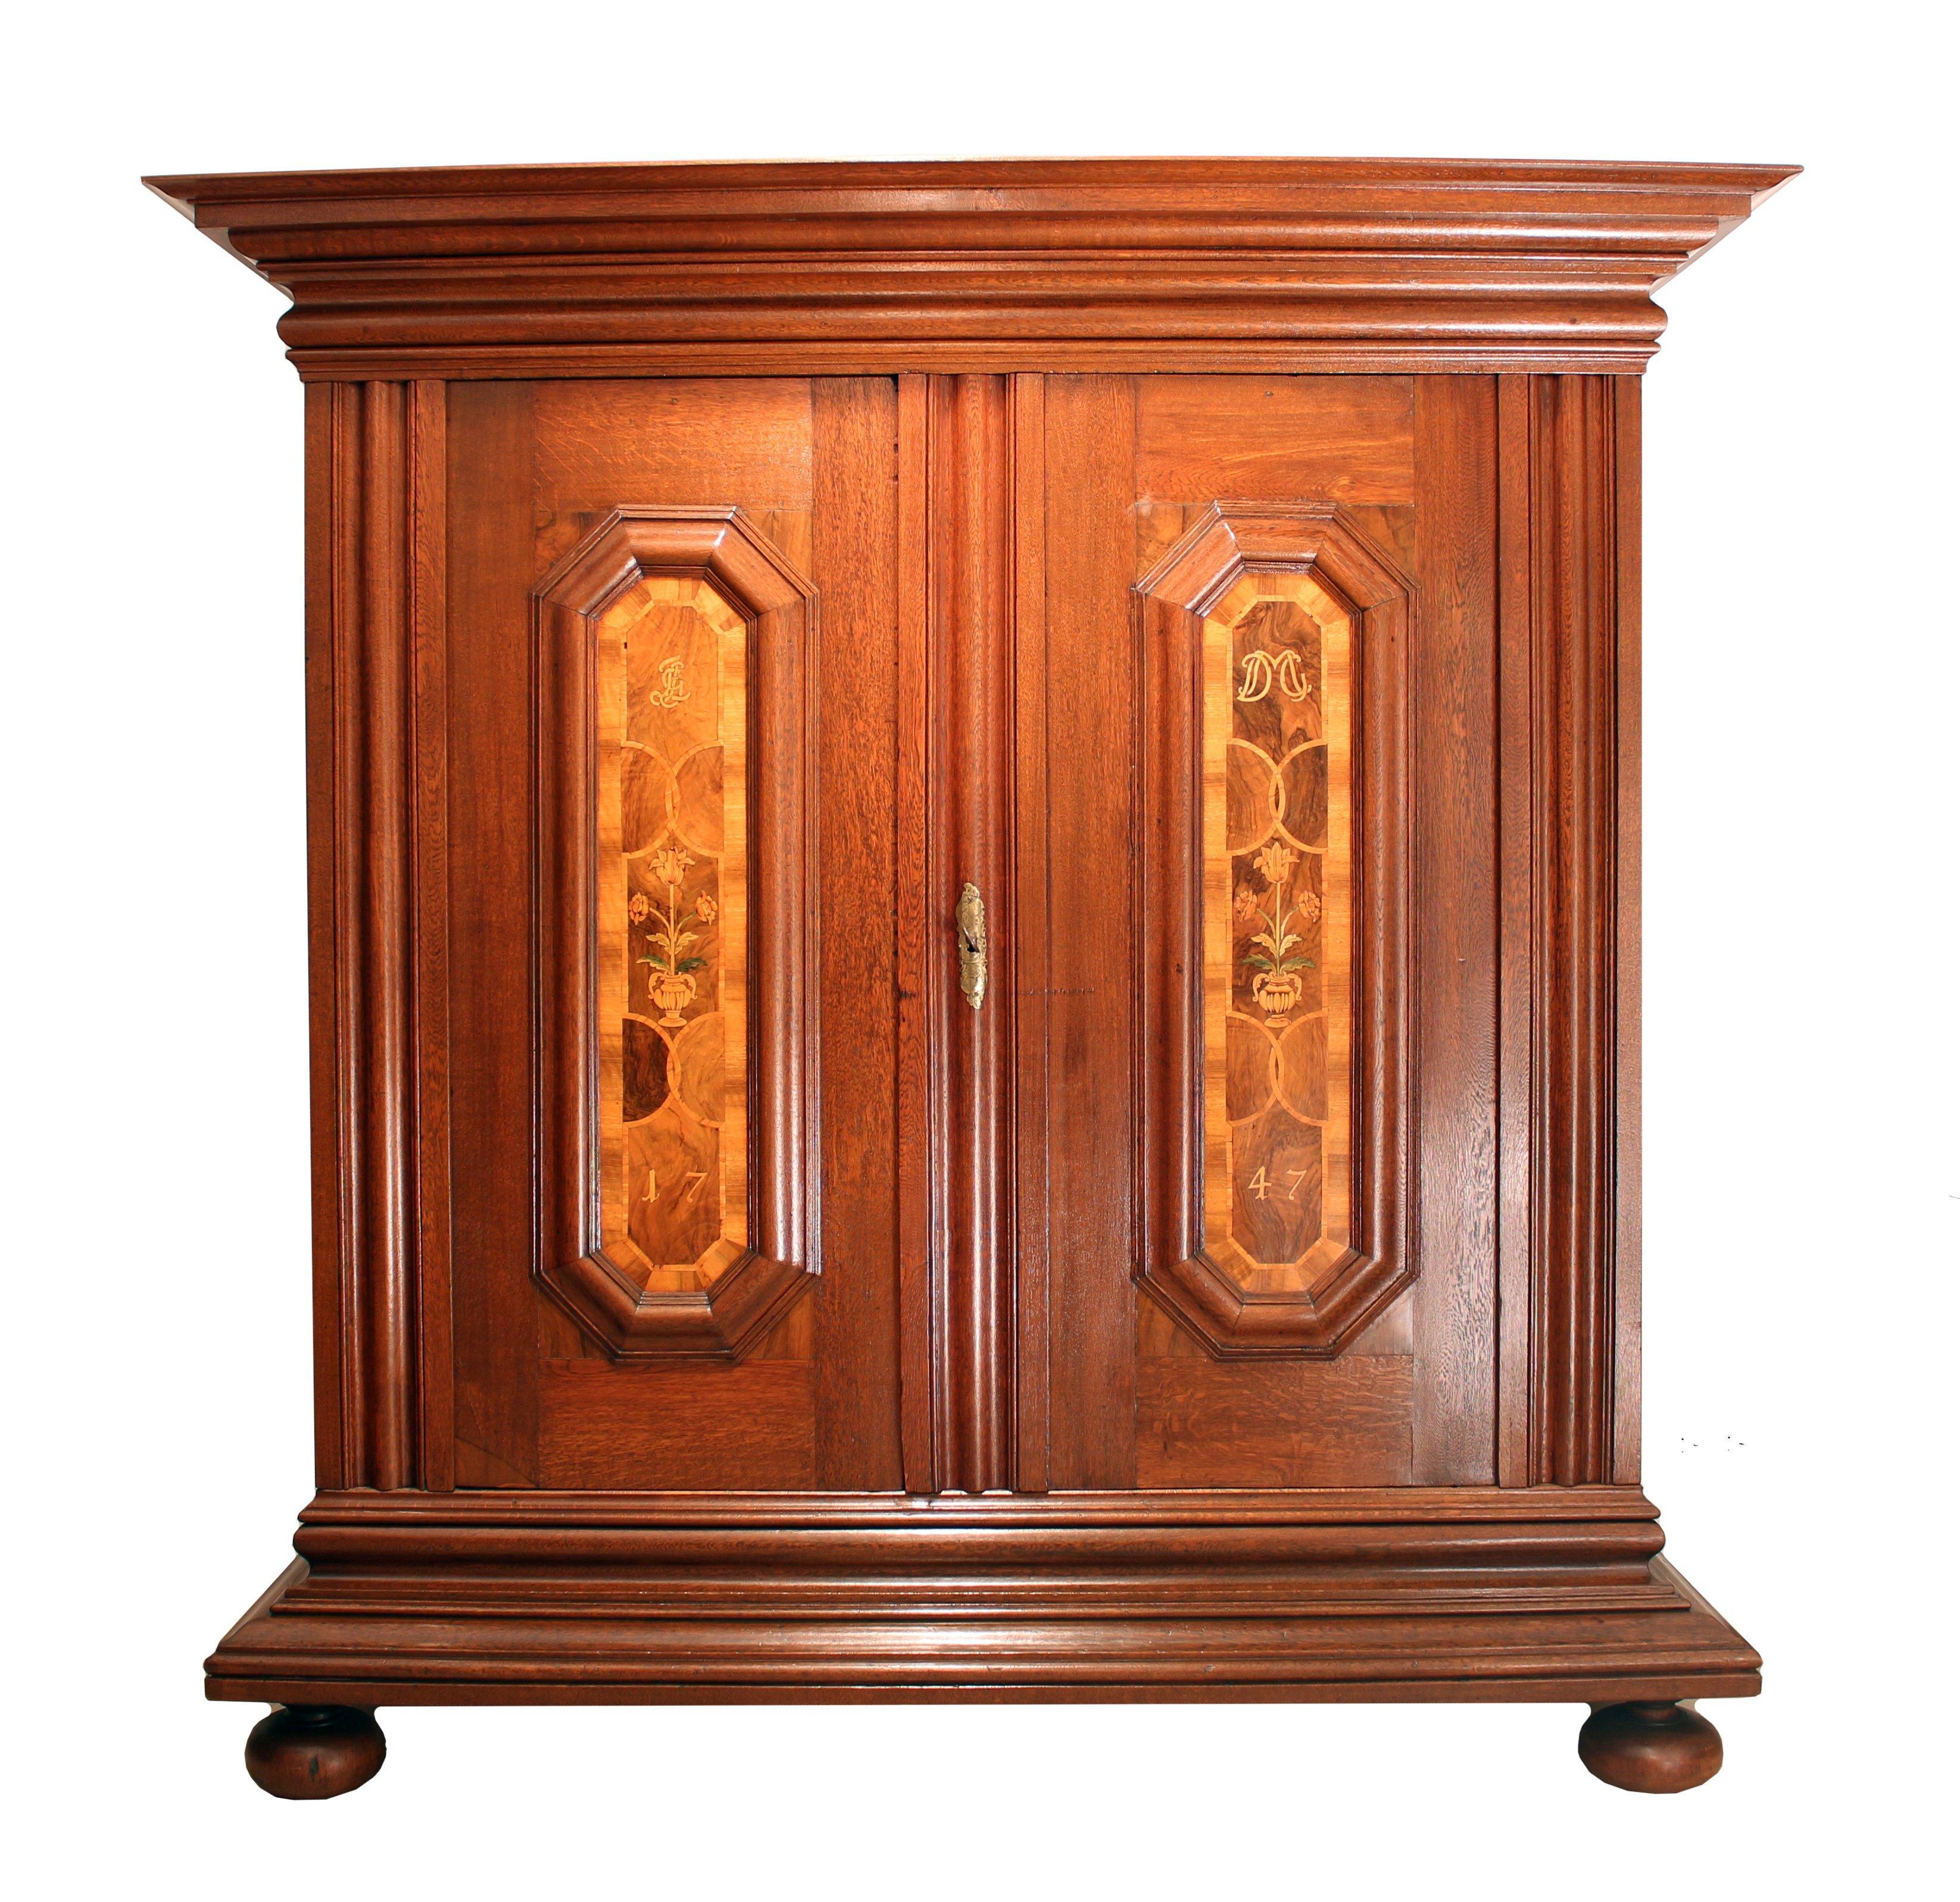 18th Century Baroque Oak Wood Wardrobe / Cabinet from Germany